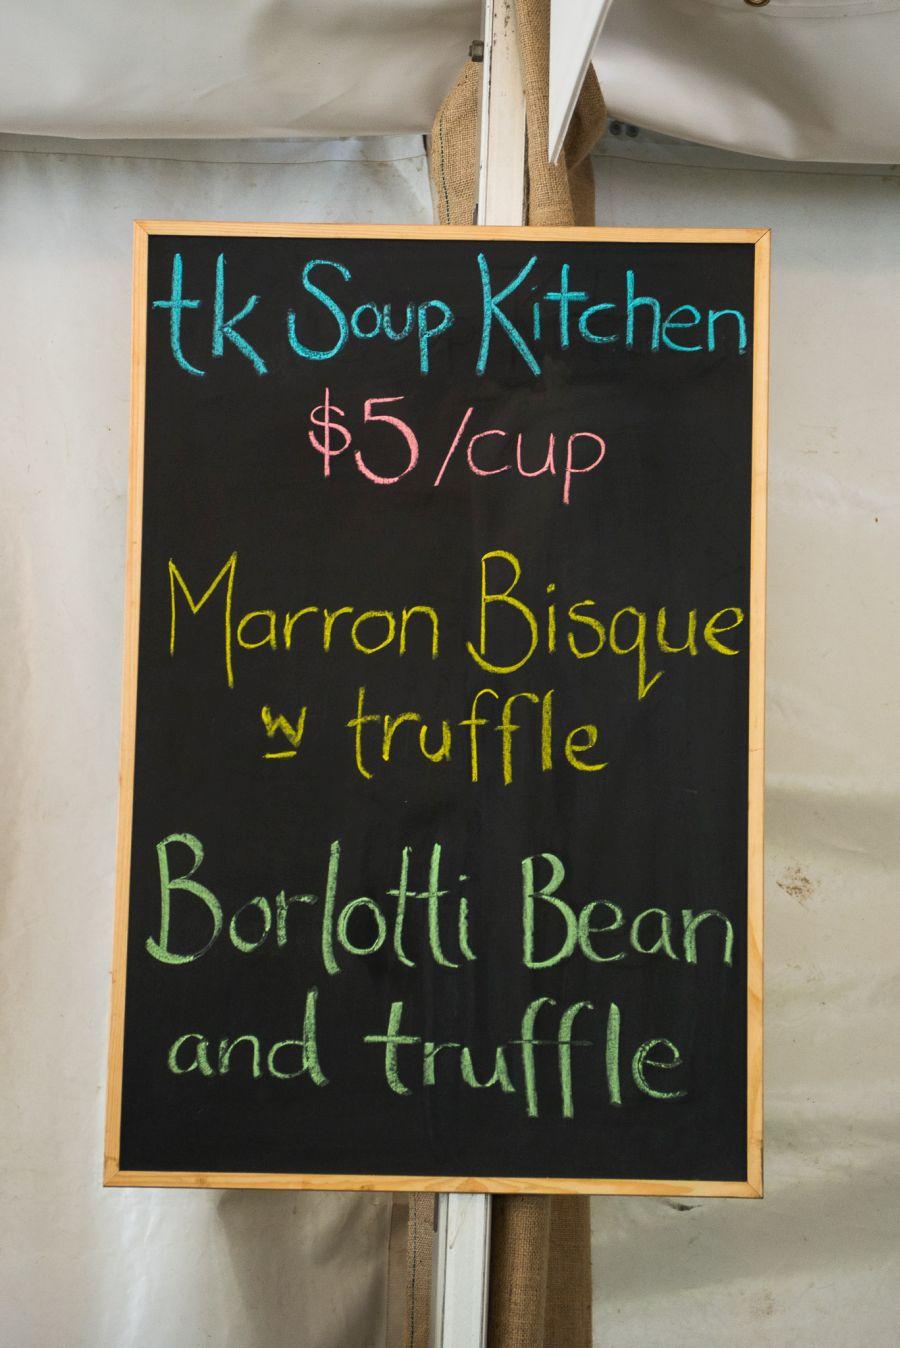 TK Soup Kitchen sign